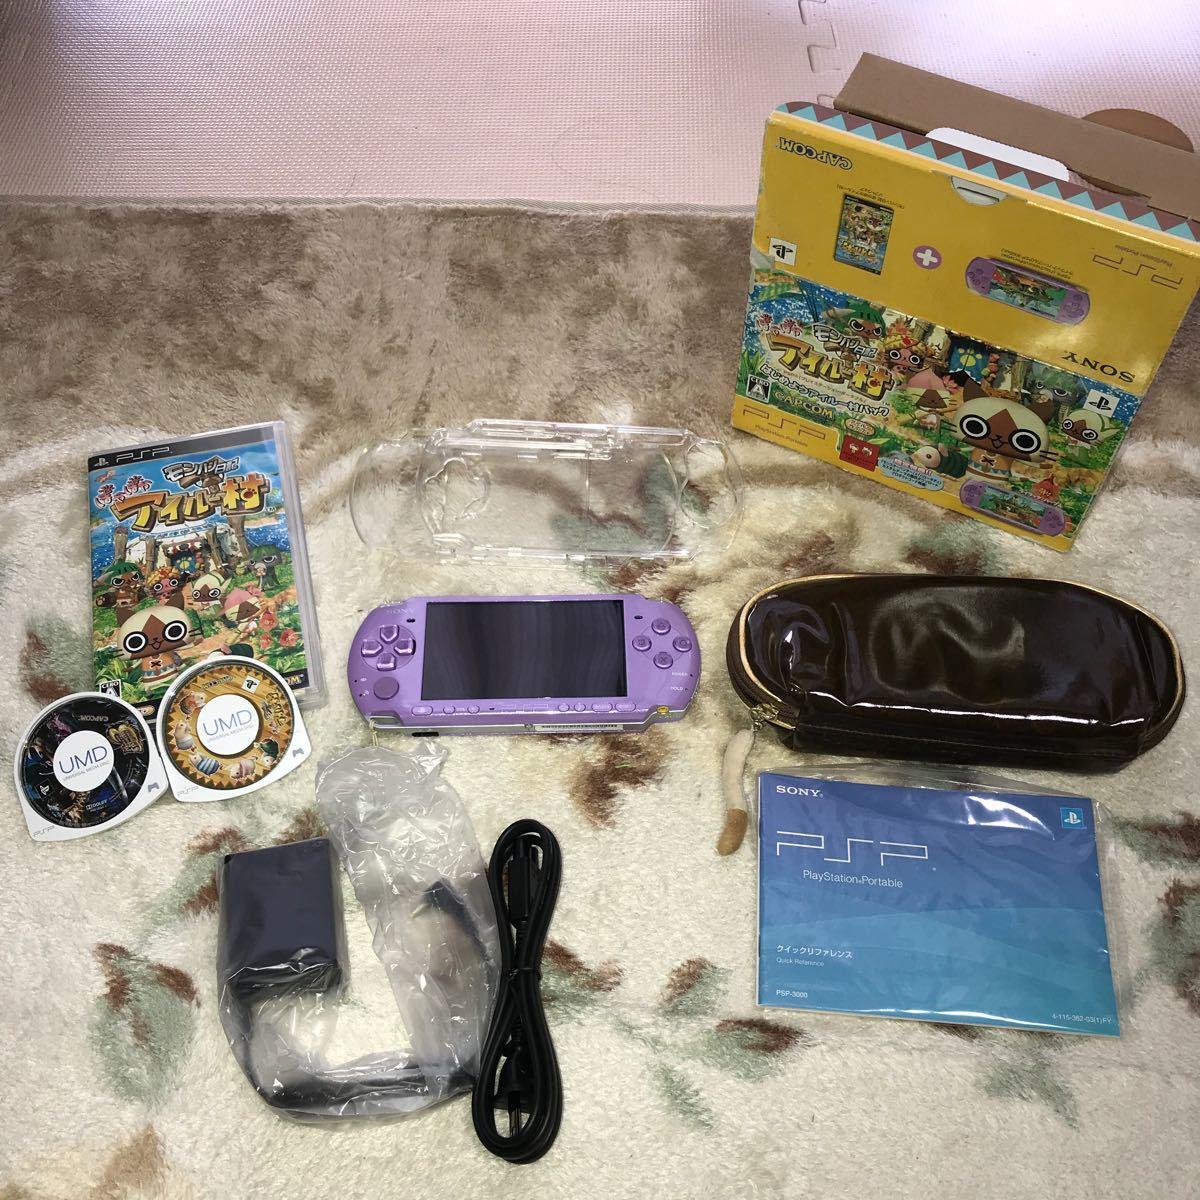 PSP 「プレイステーションポータブル」 はじめようアイルー村パック (PSPJ-30016) SONY ソニー